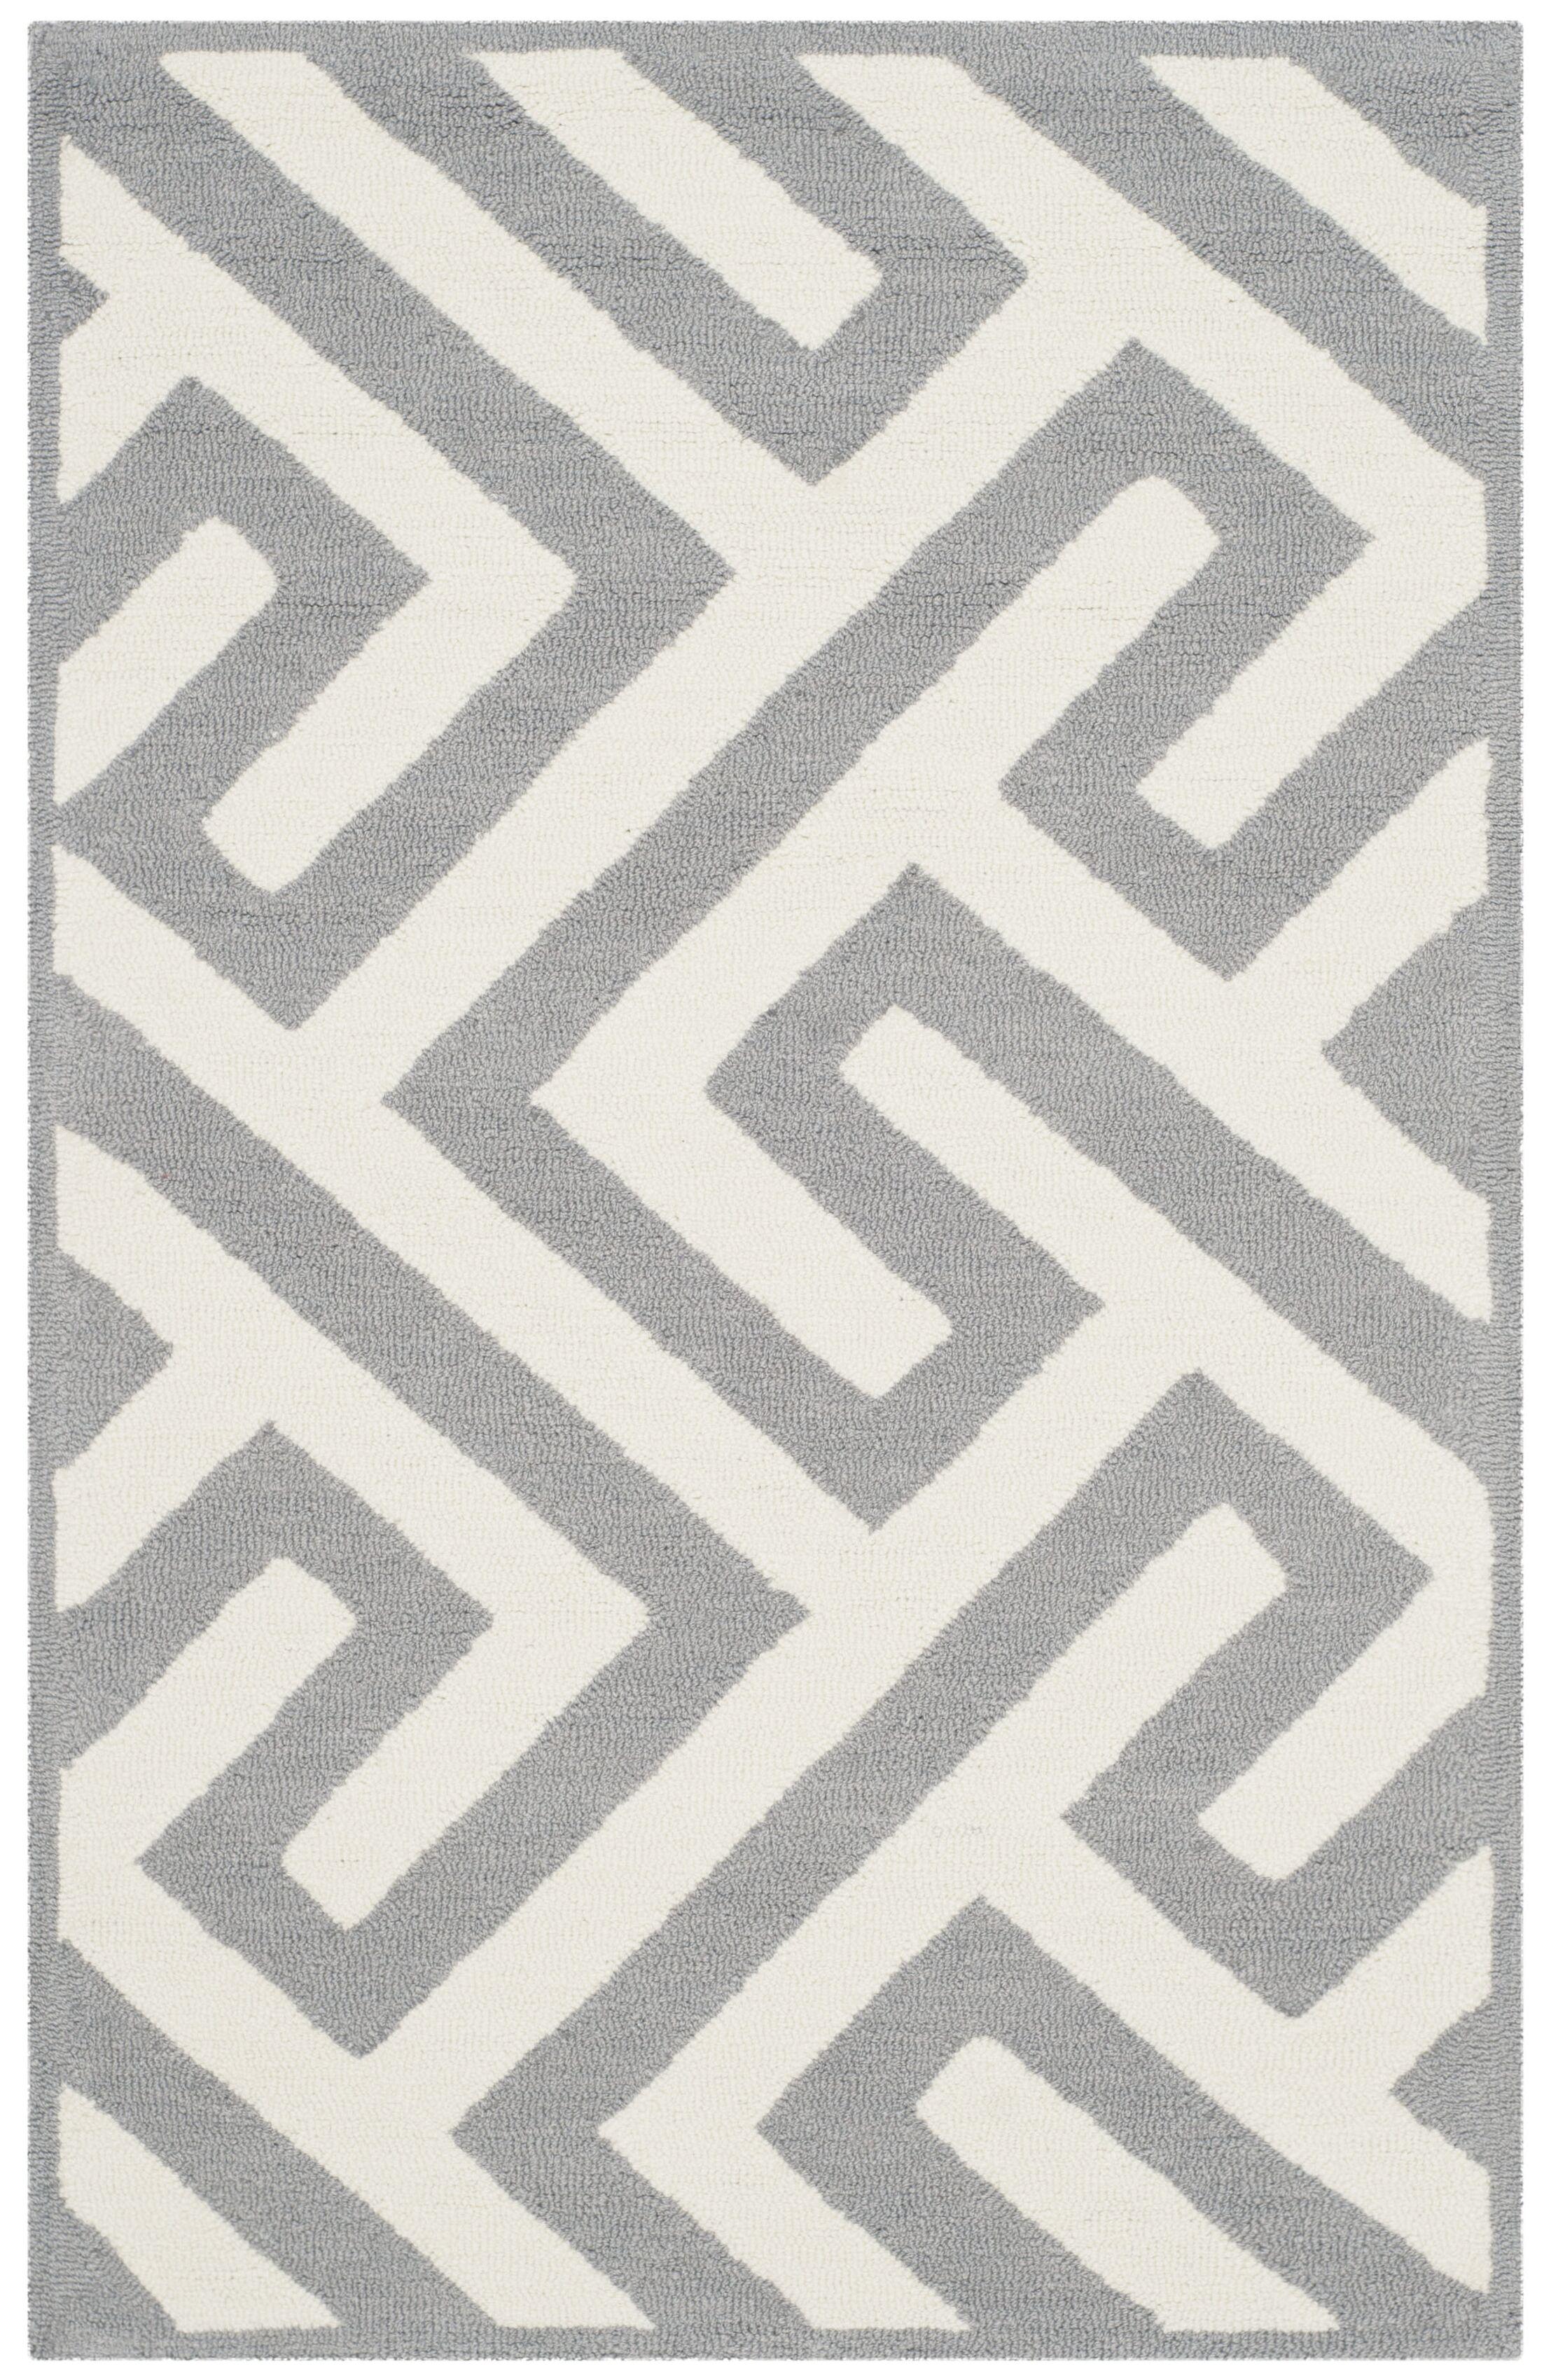 Daniella Ivory/Gray Area Rug Rug Size: Rectangle 8' x 10'